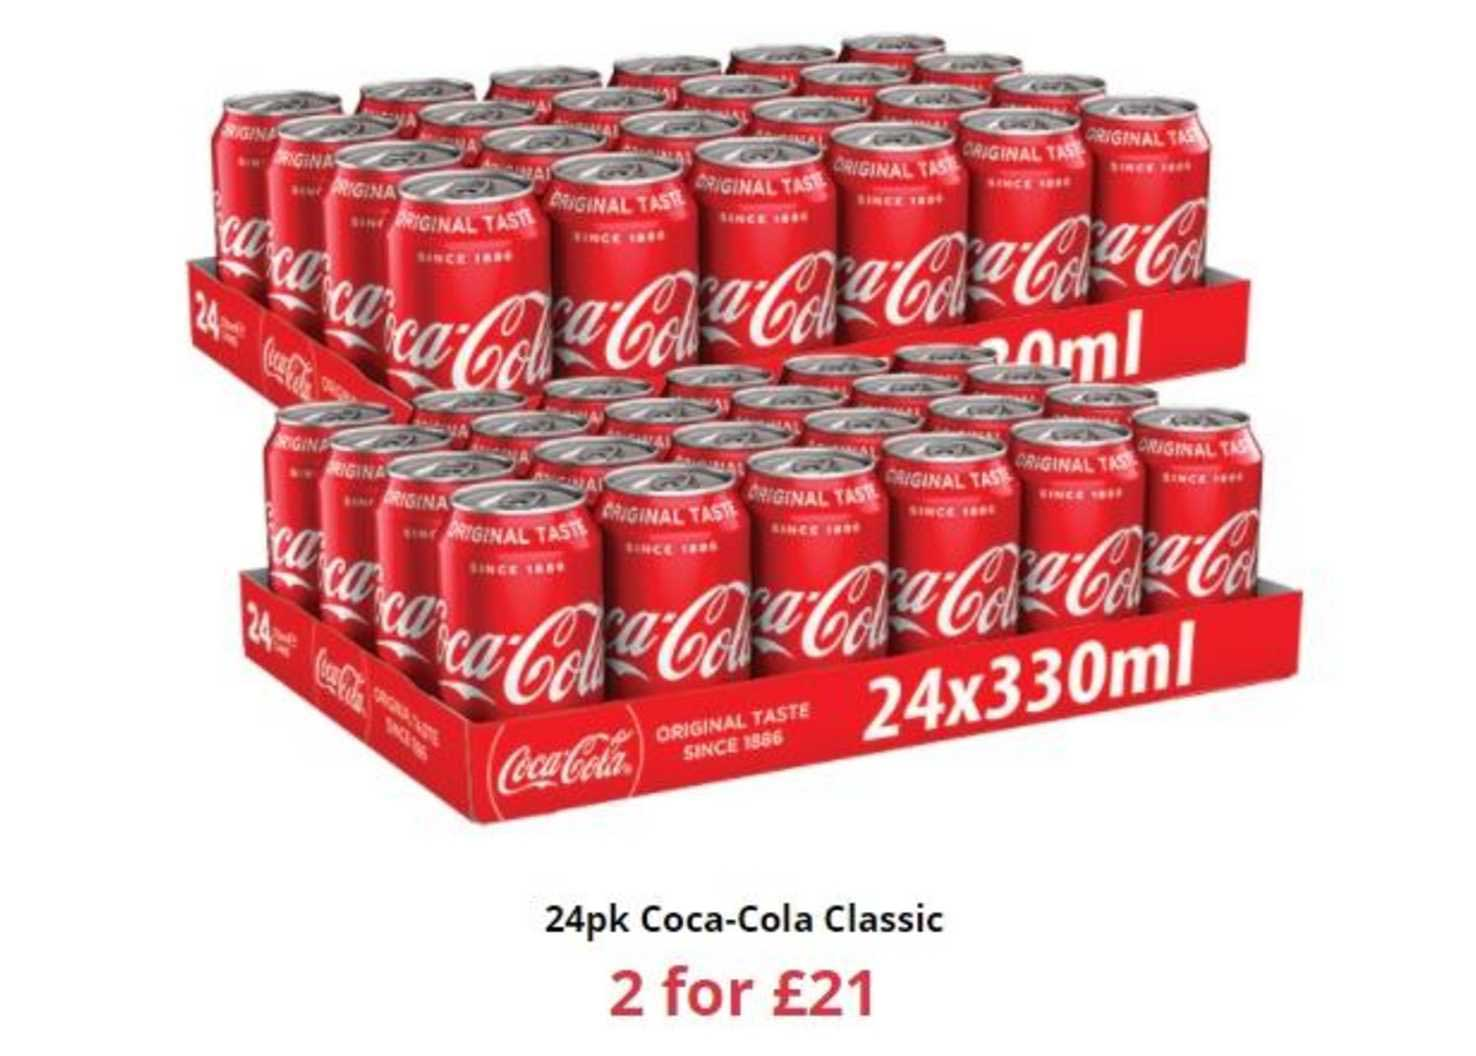 Farmfoods 24pk Coca-cola Classic